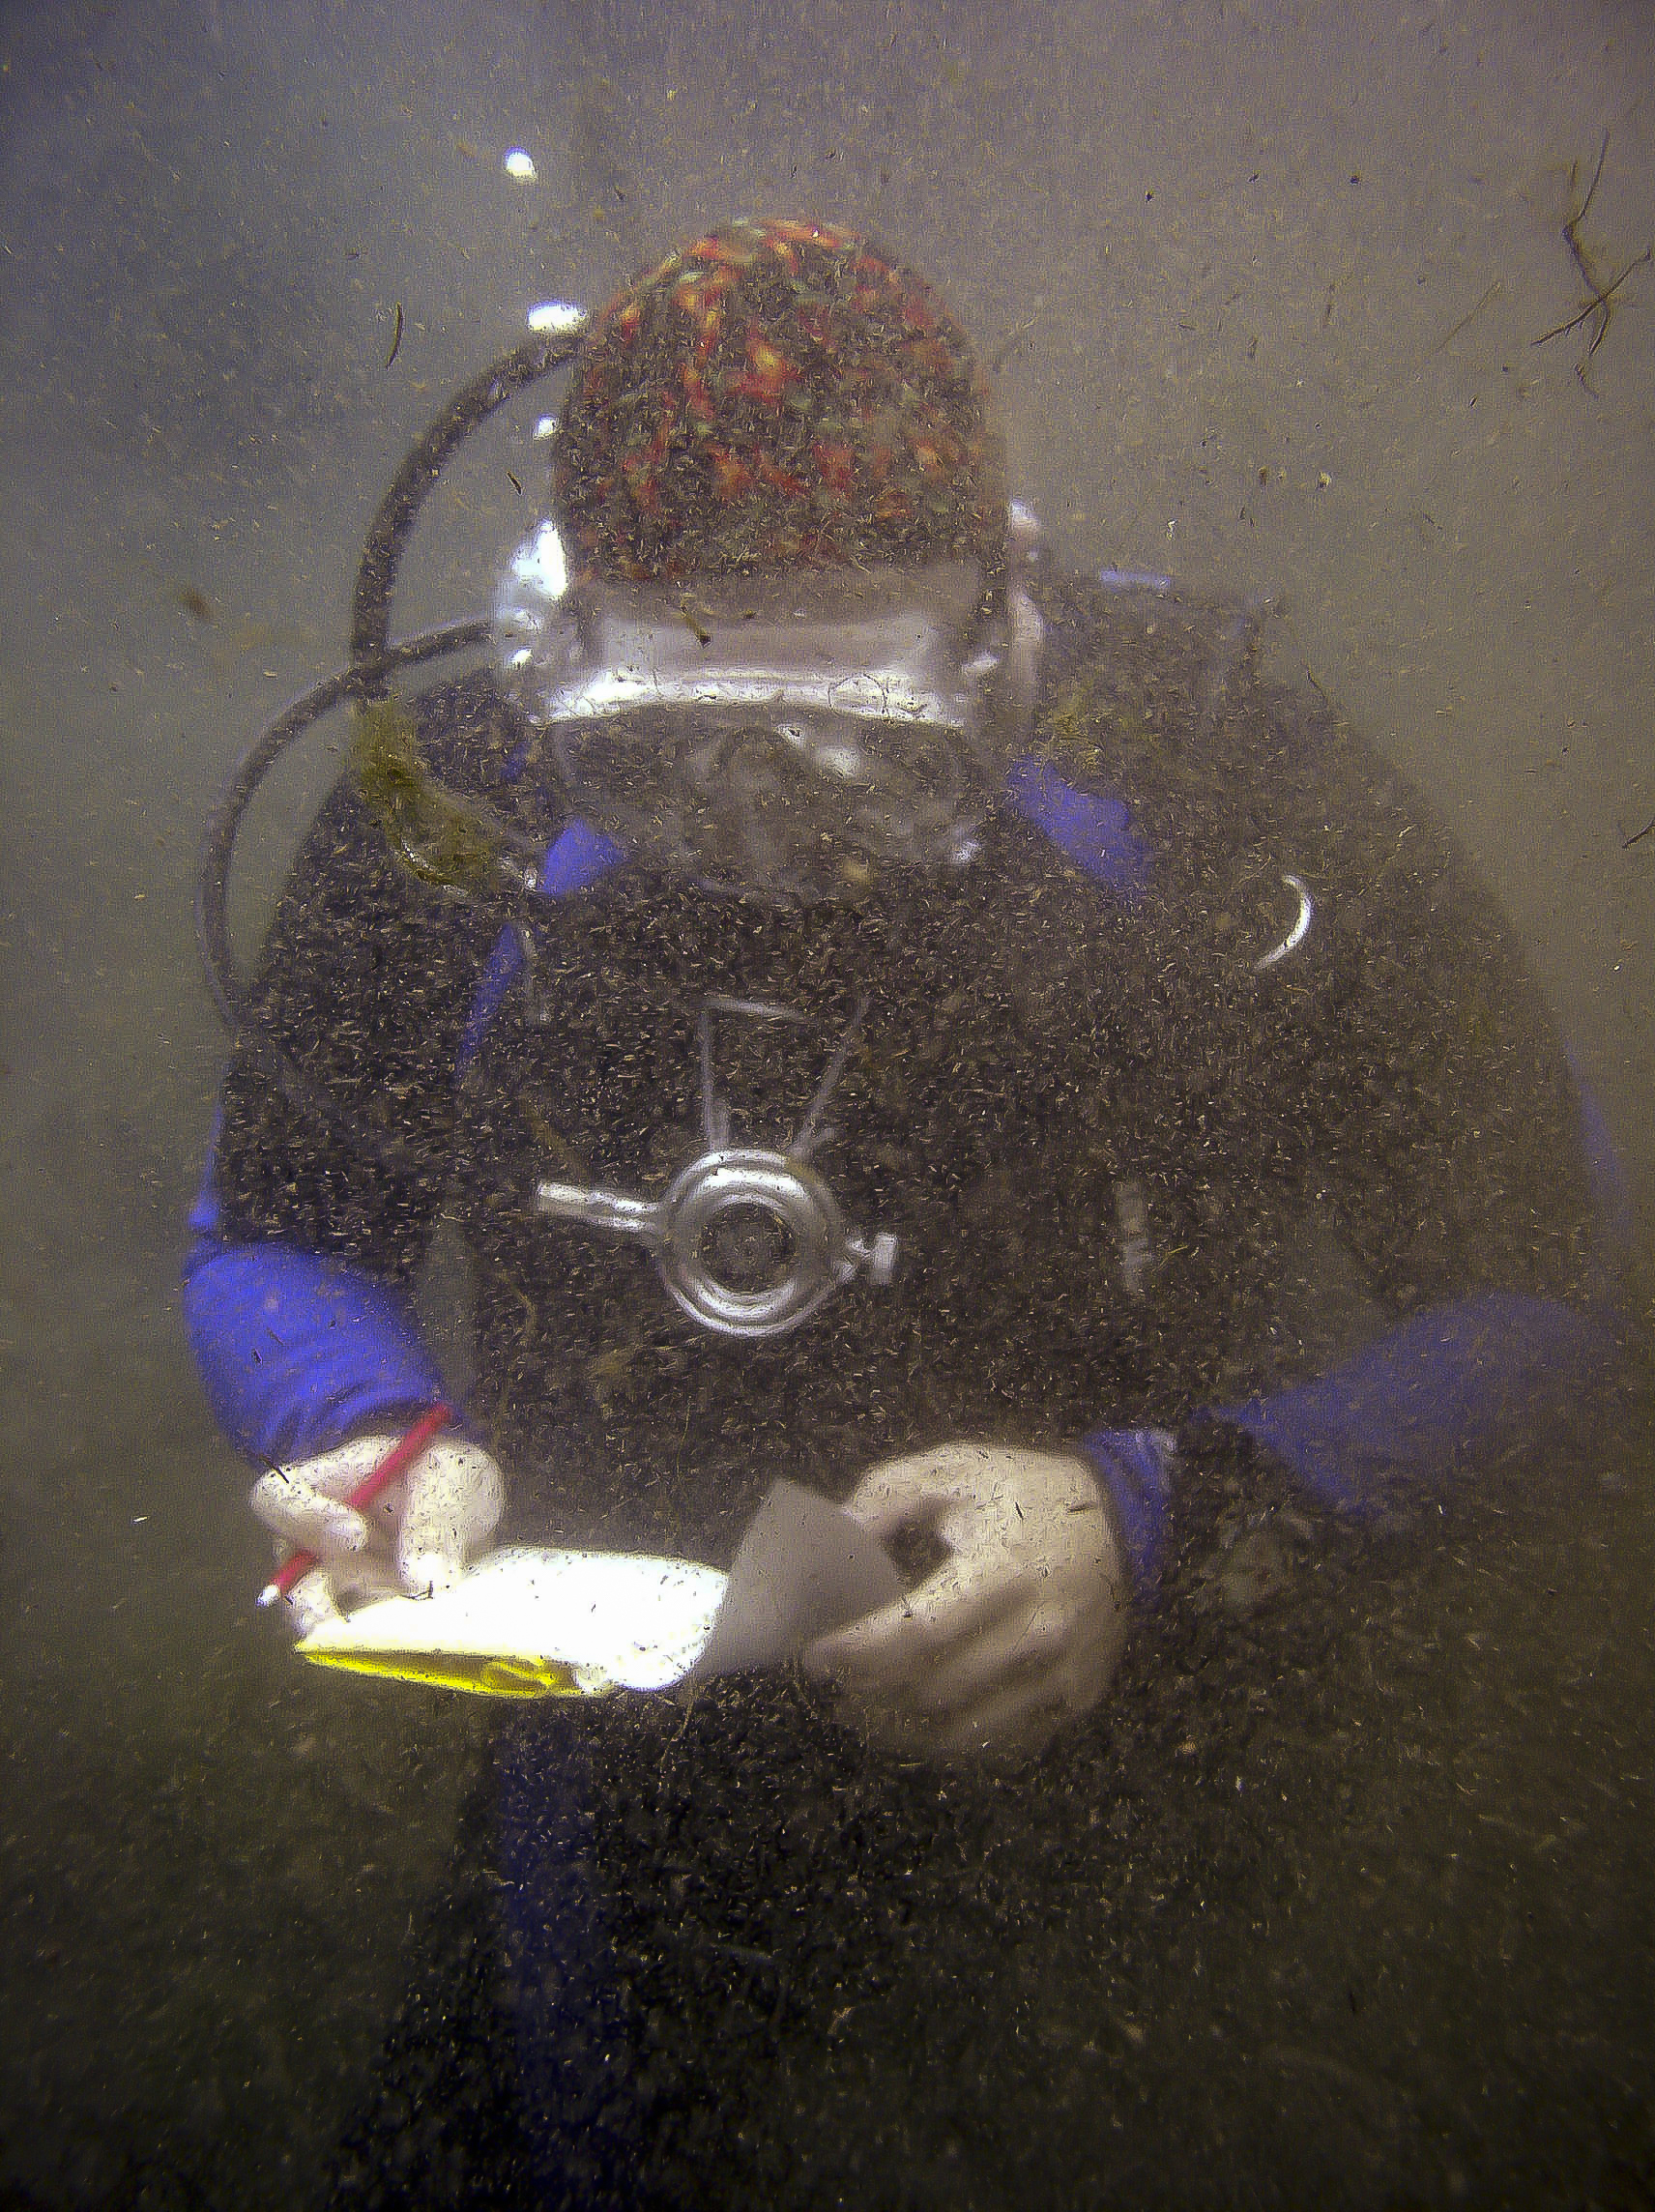 03_21_04_Underwater_Archaeology_10.jpg